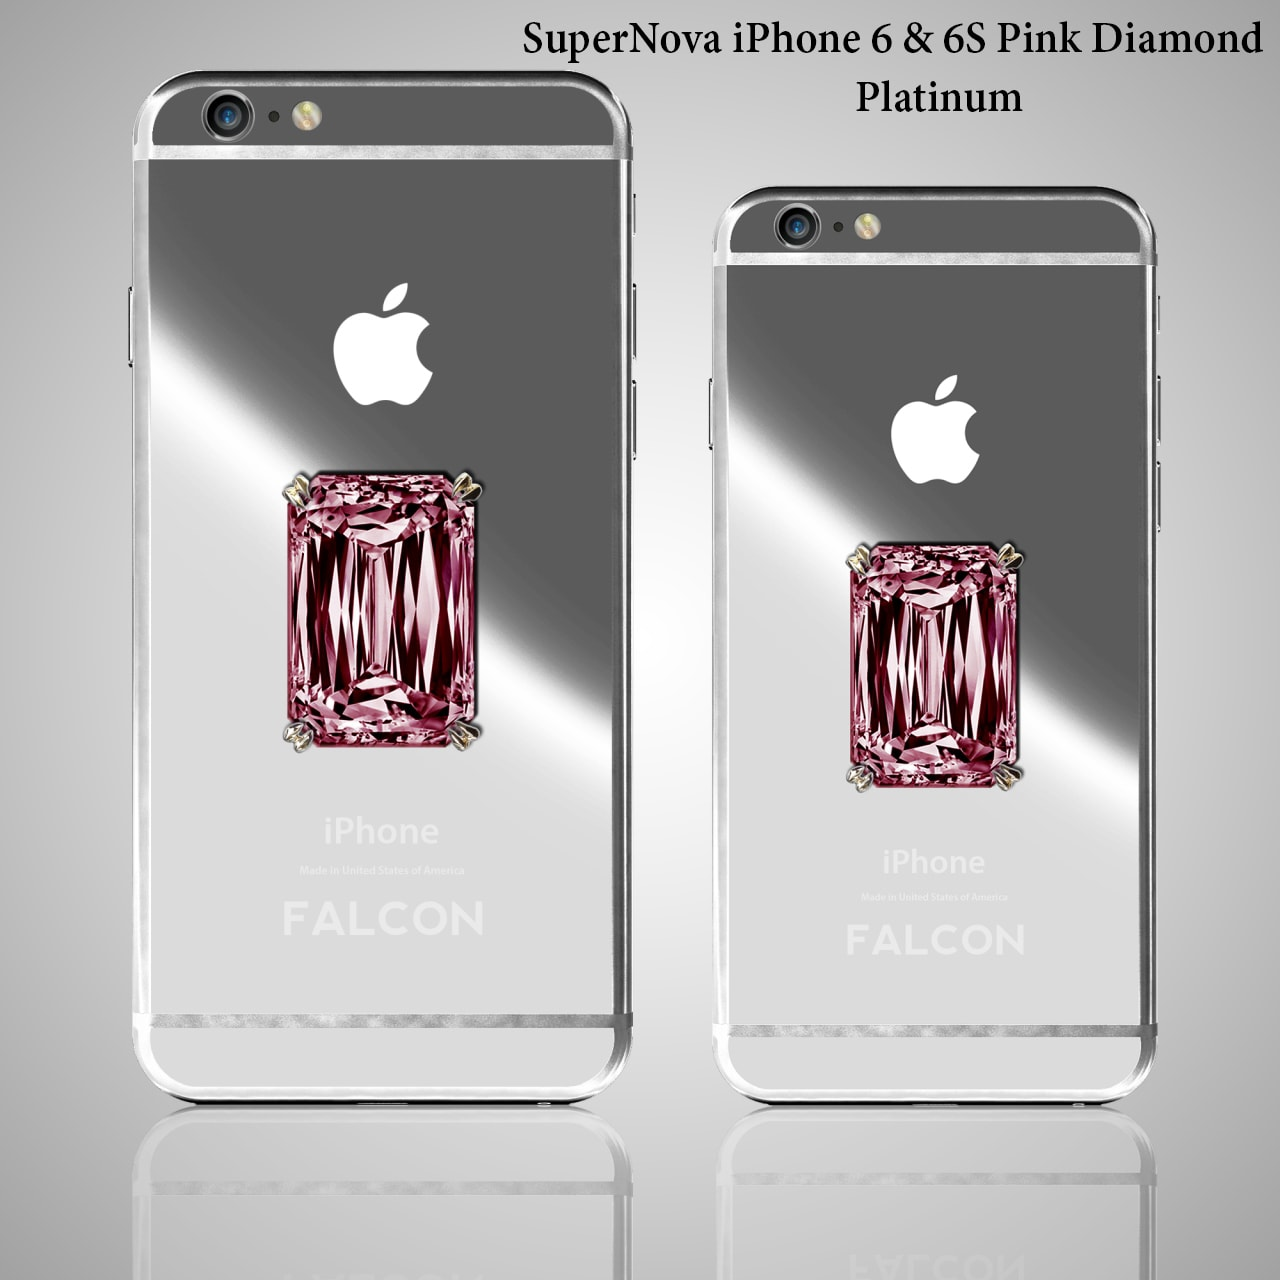 FALCON-SuperNova-Platinum-iPhone-Pink-Diamond